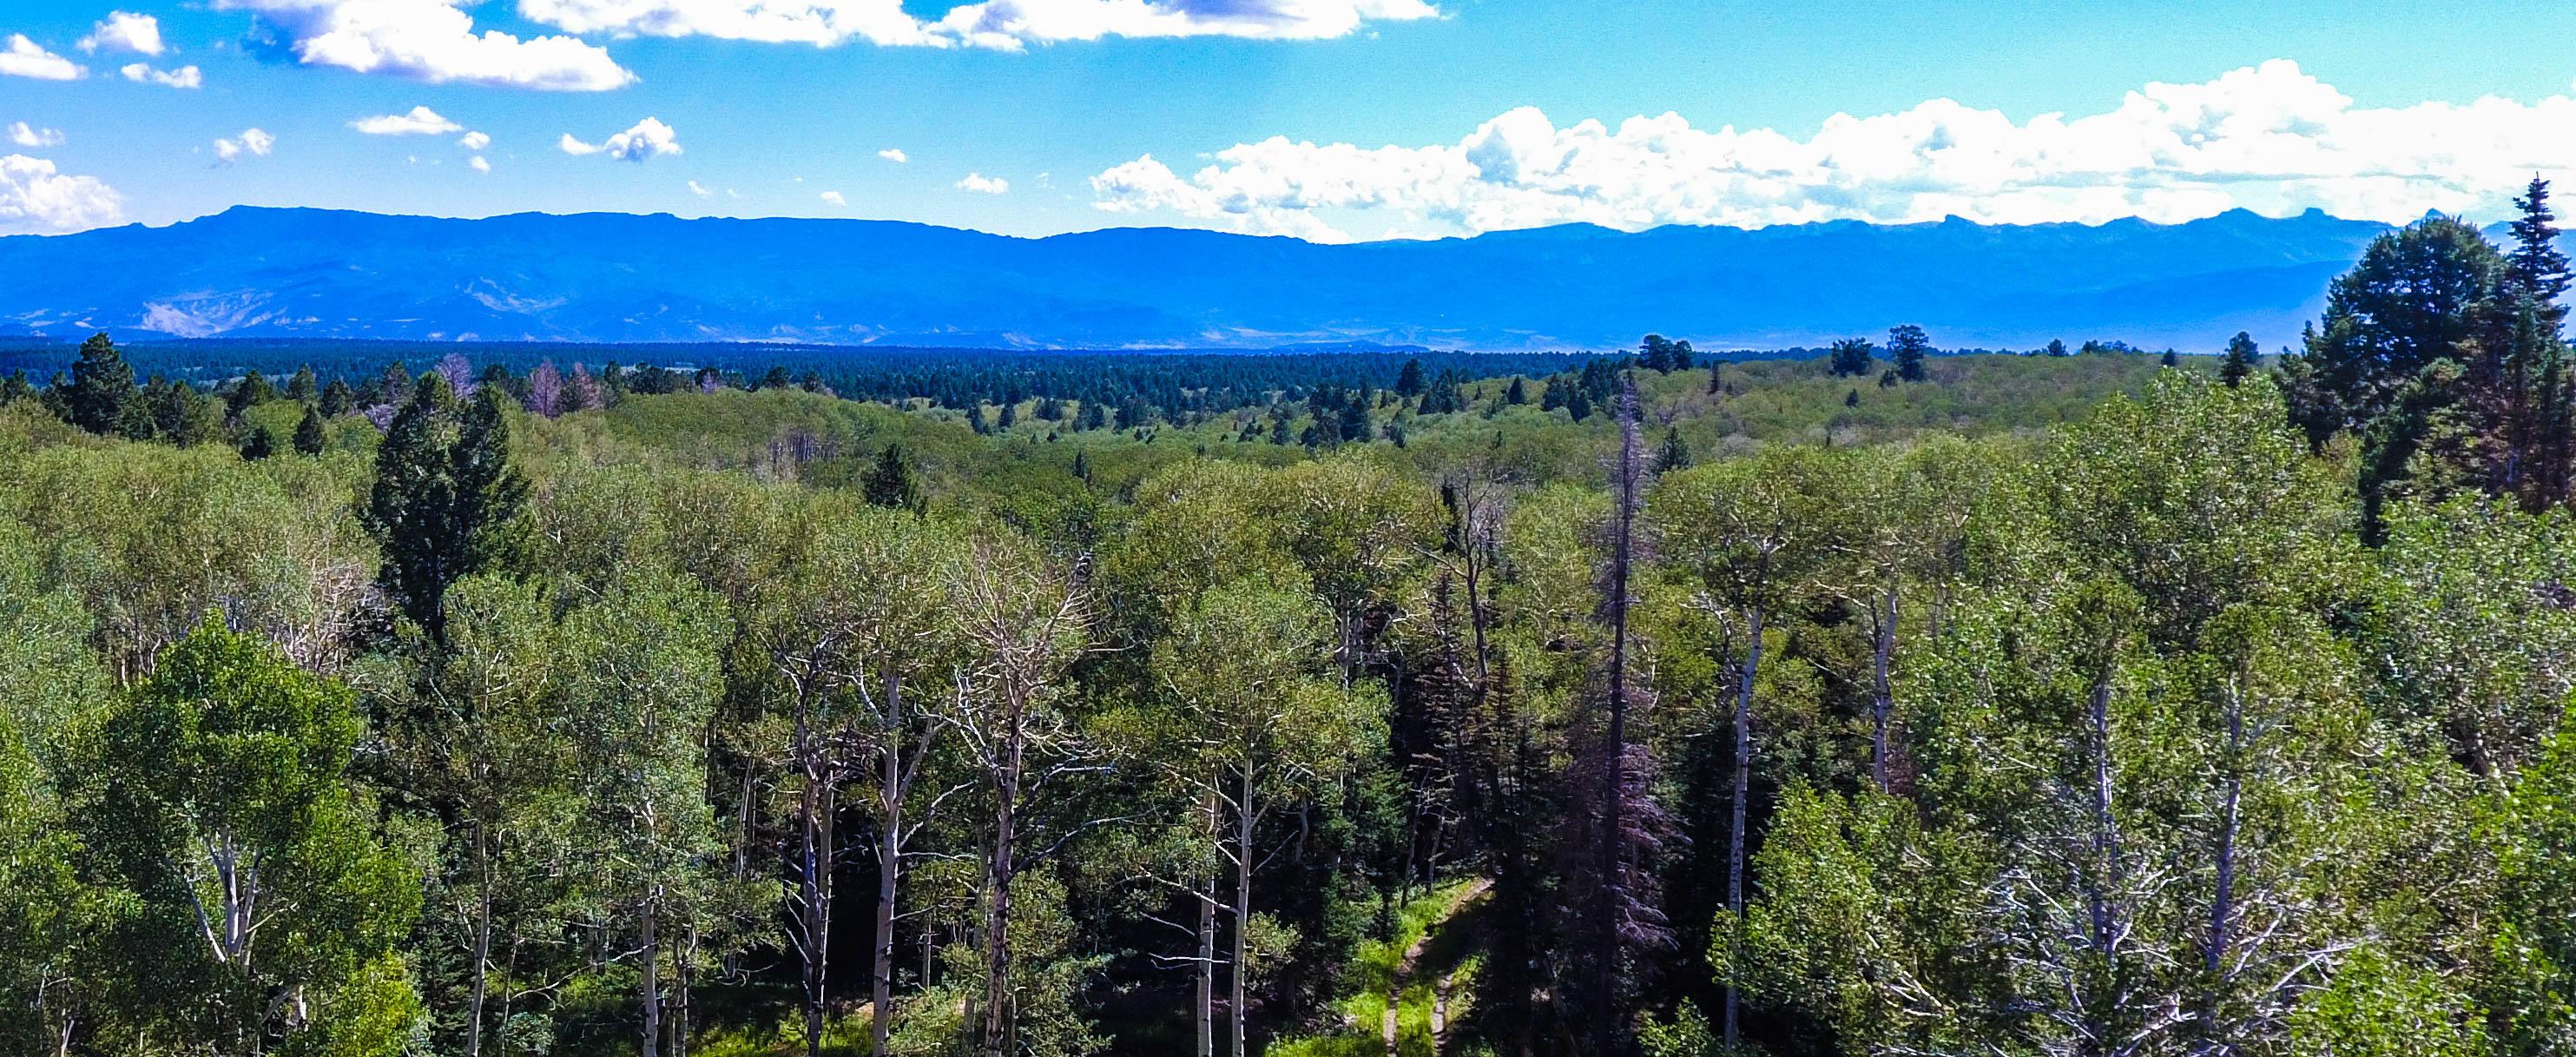 Lot 7 455 Black Bear Trail Ridgway CO 81432